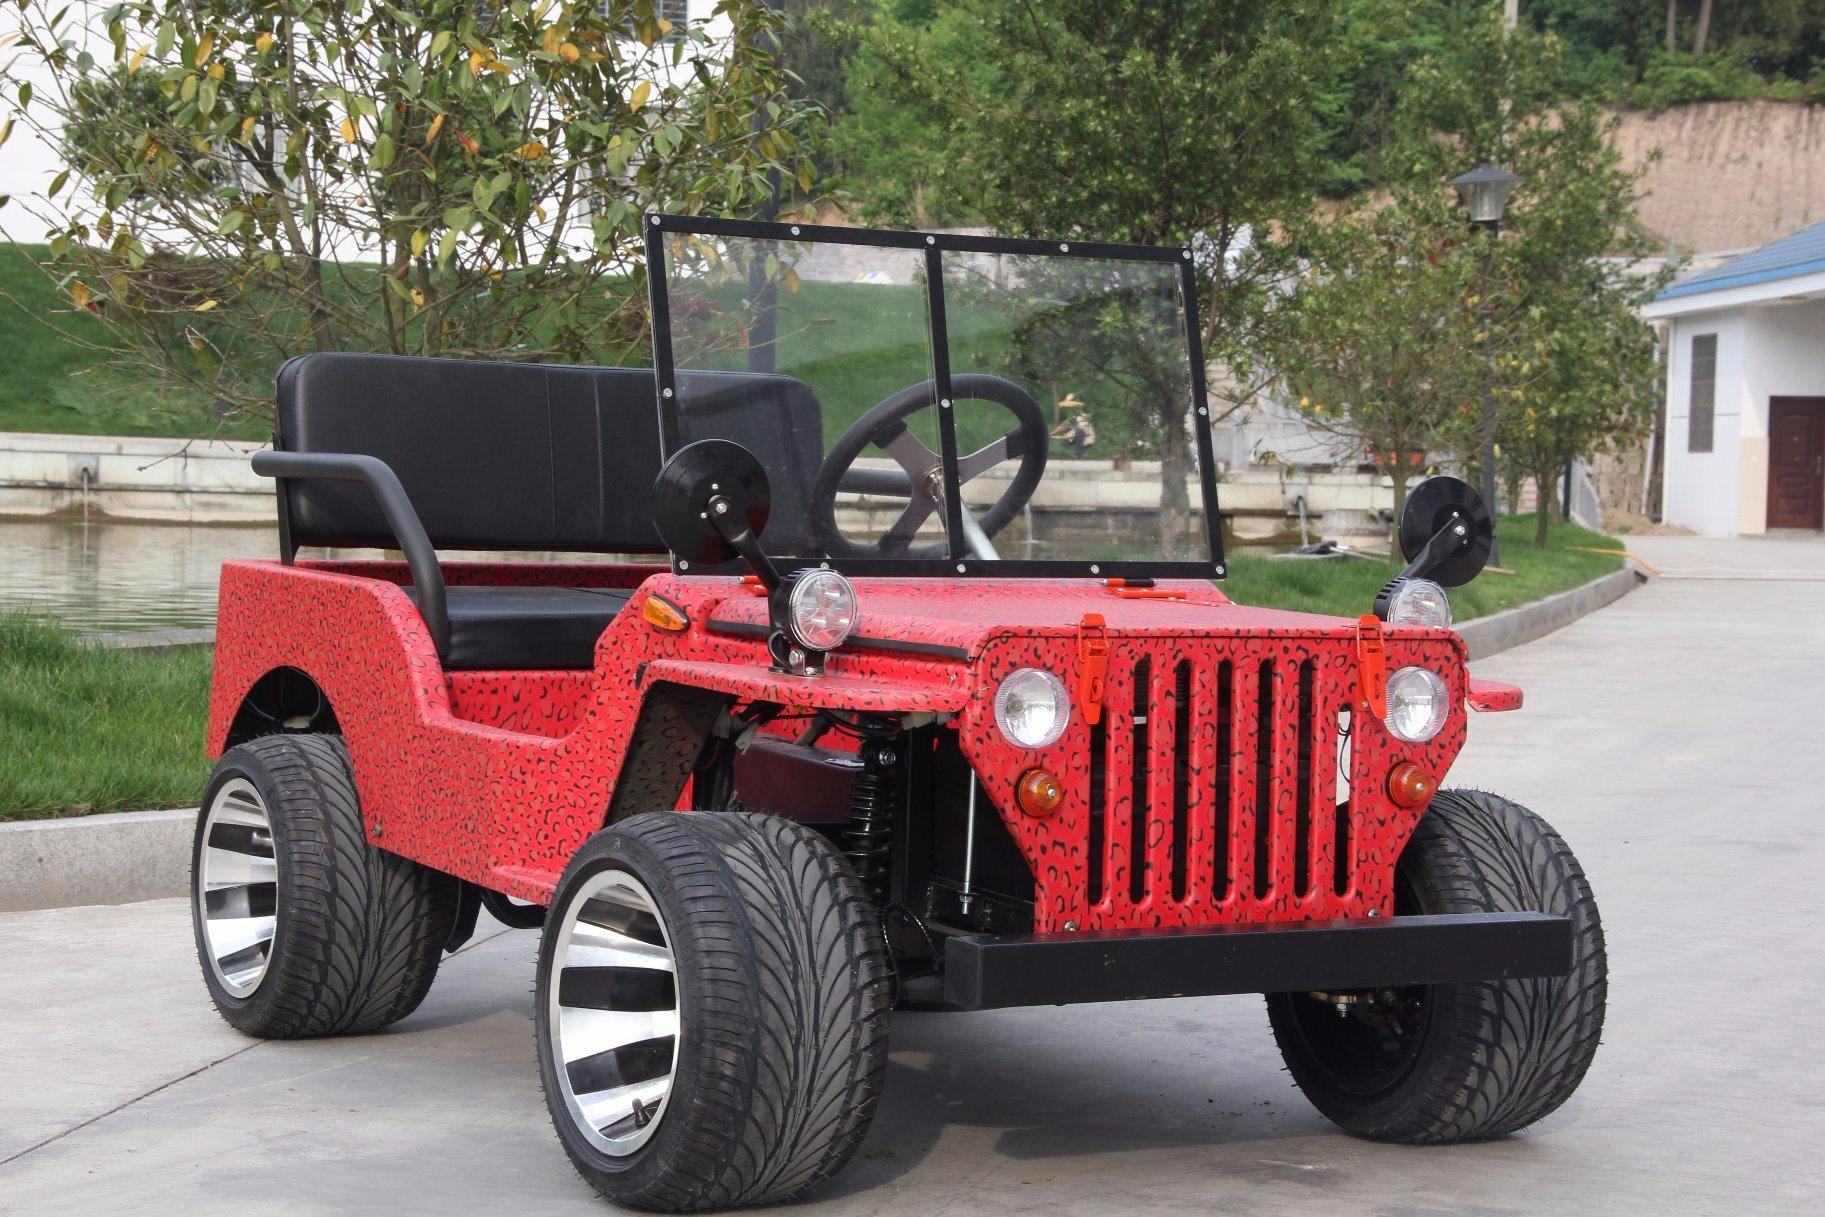 China Manufacture of 110cc 125cc 150cc Mini Jeep Willsy ATV